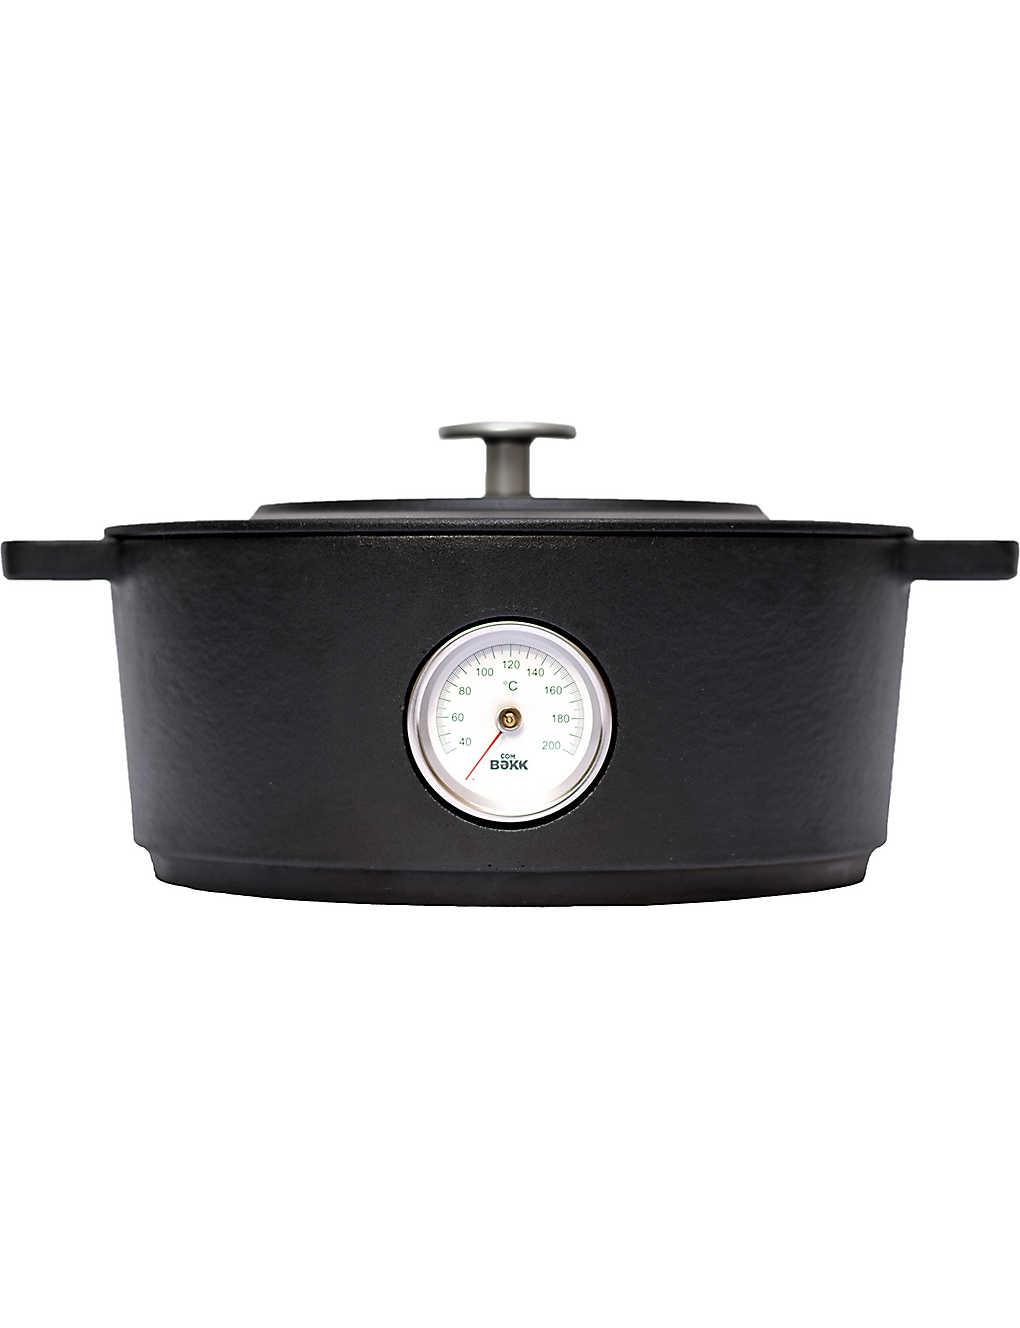 COMBEKK HOMEWARE - Thermometer dutch oven 28cm | Selfridges com